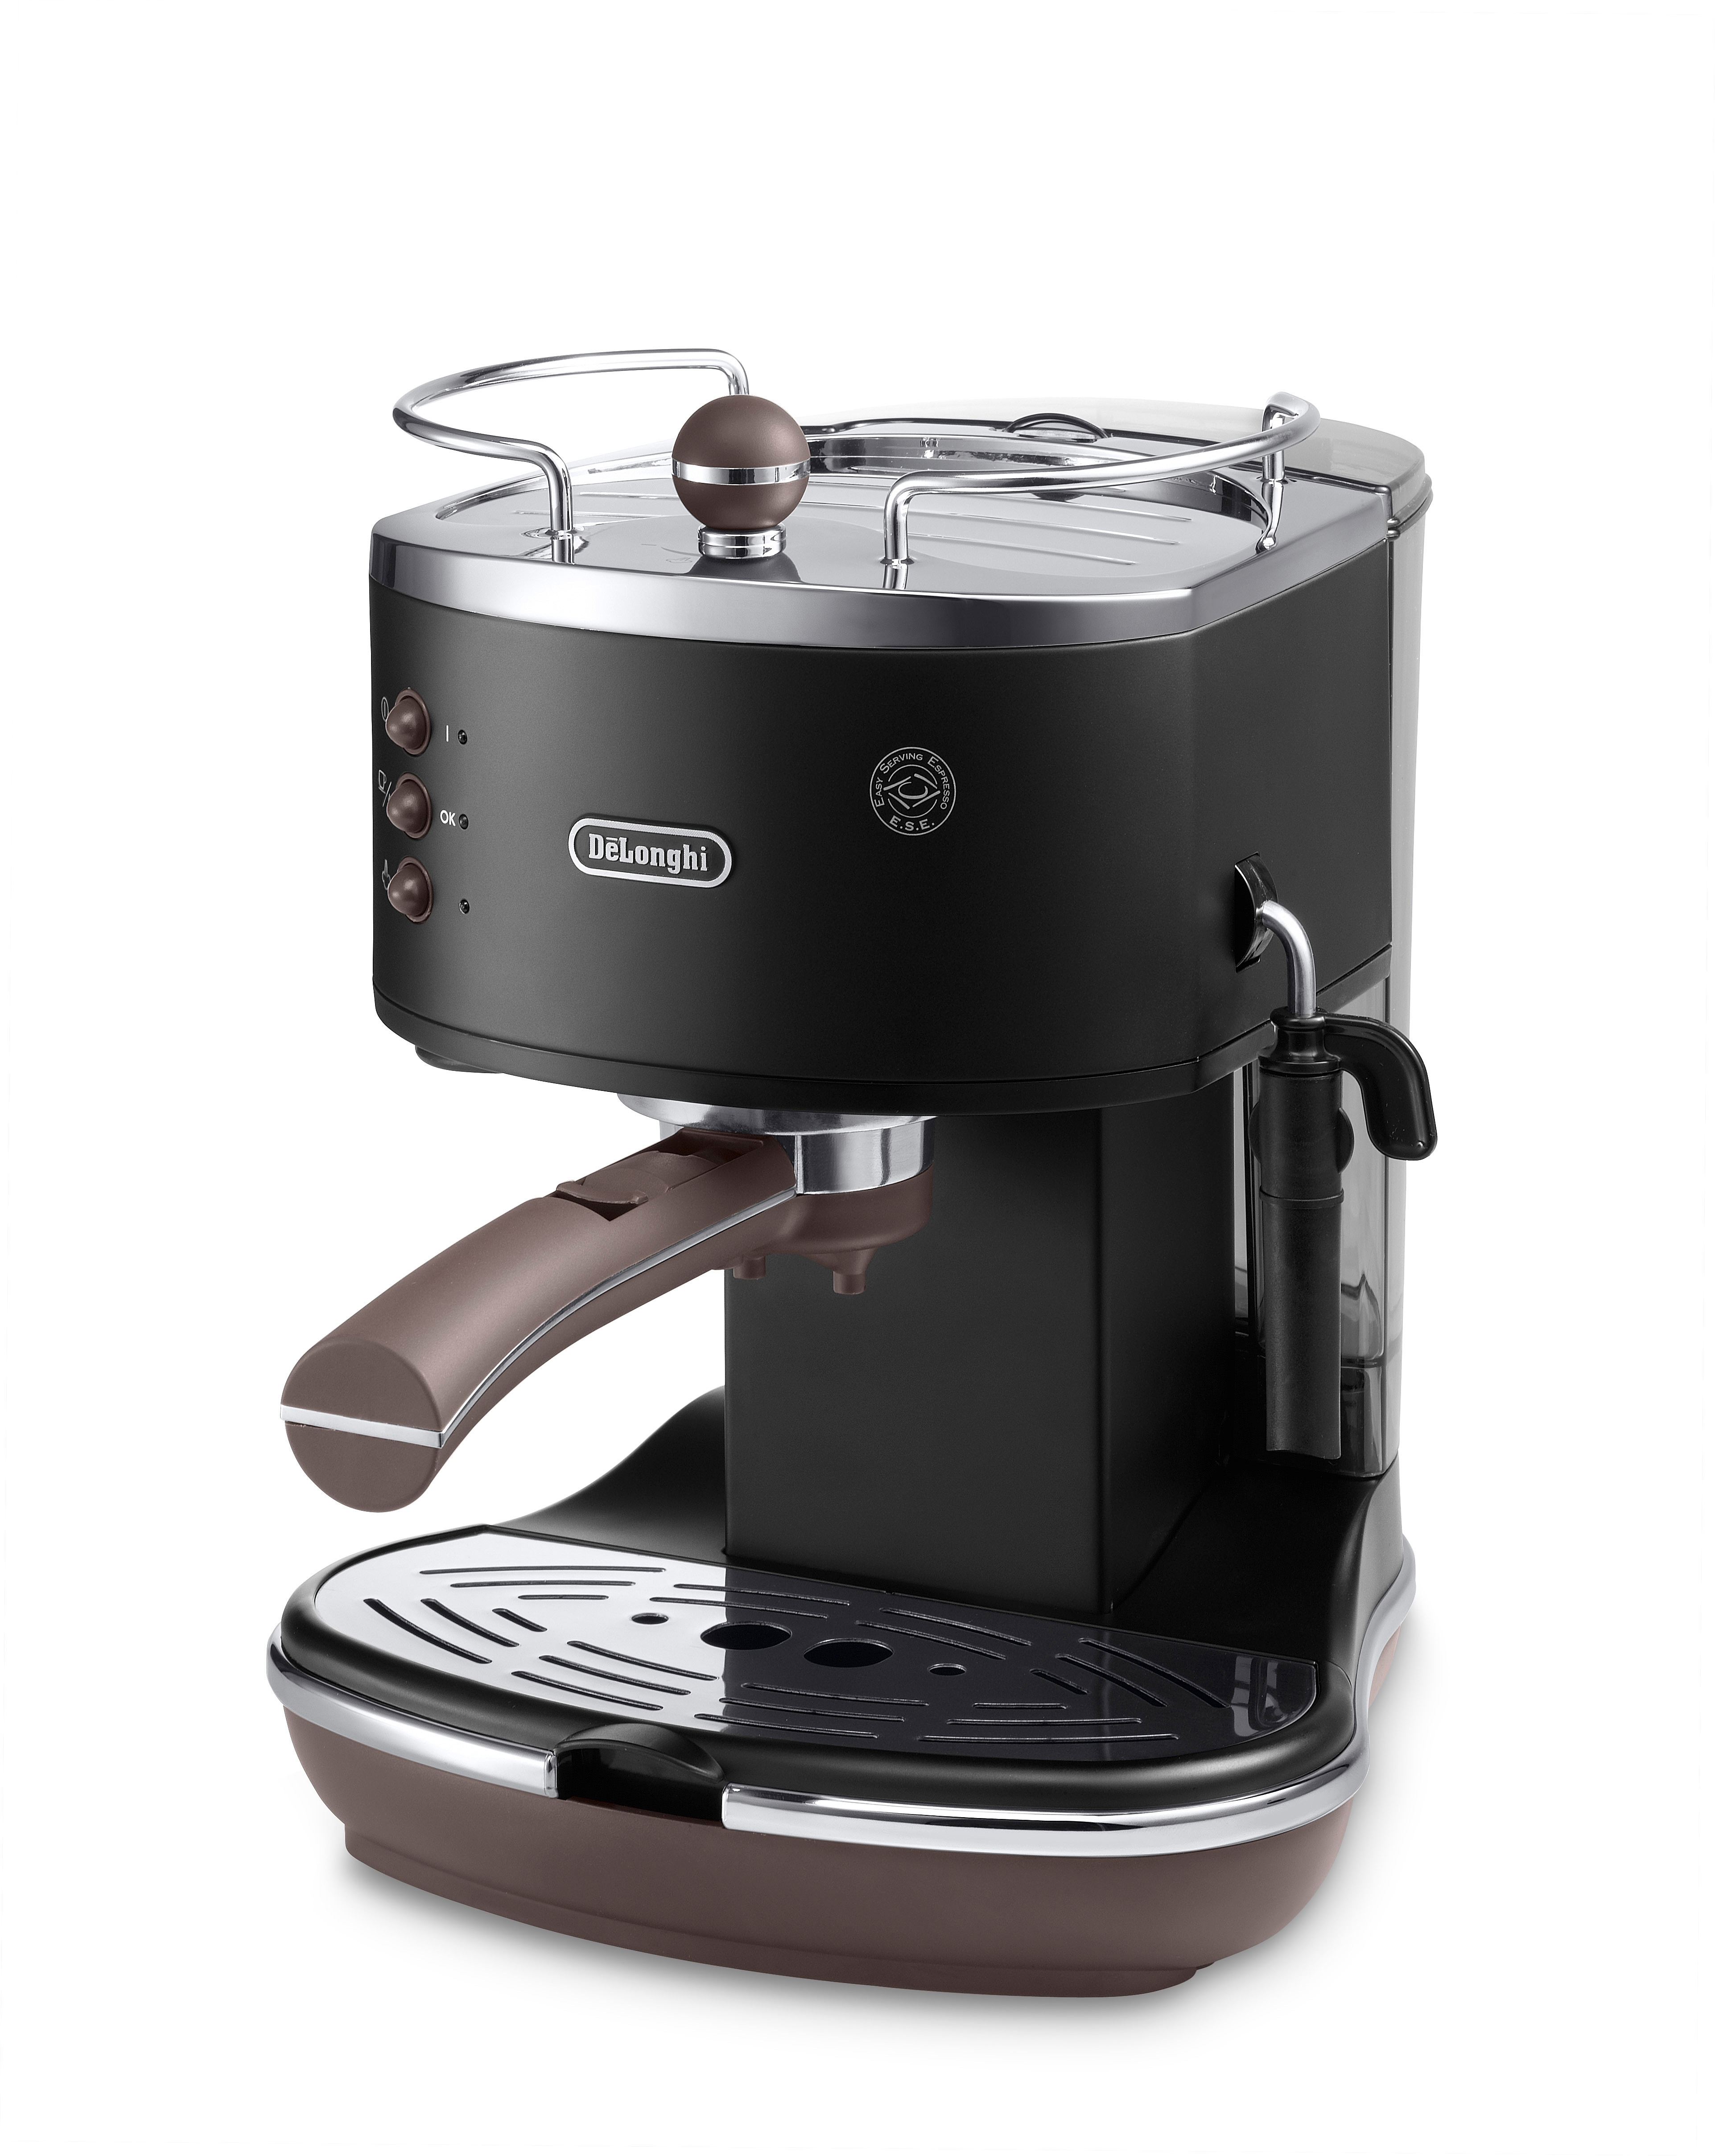 De'Longhi Espresso-apparaat ECOV 311.BK - verschillende betaalmethodes